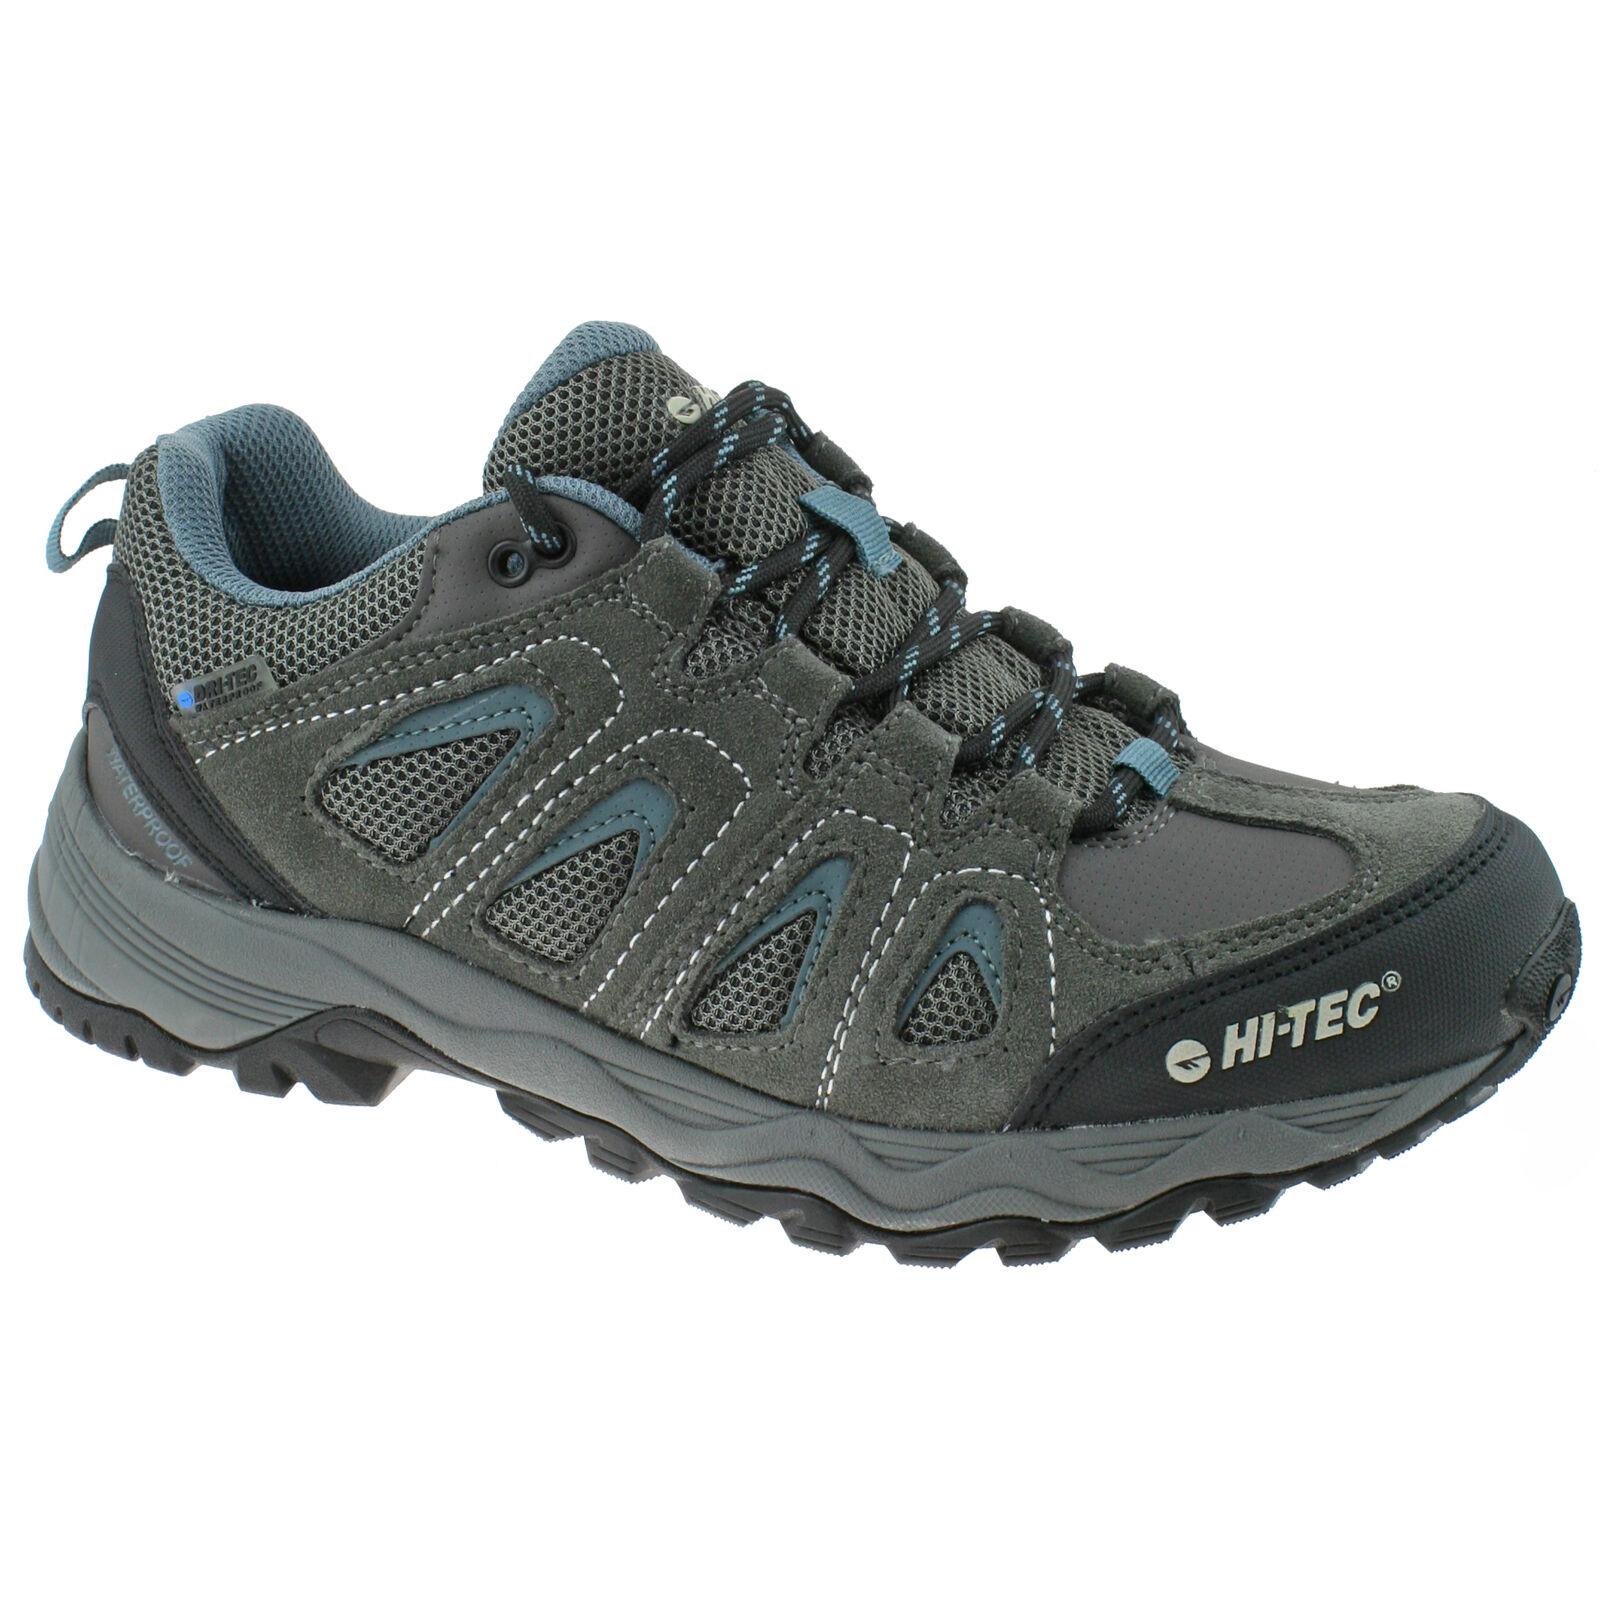 Herren HI-TEC Signal Hill wasserfest grau/blau Schuhe Wandern Größe 7-13